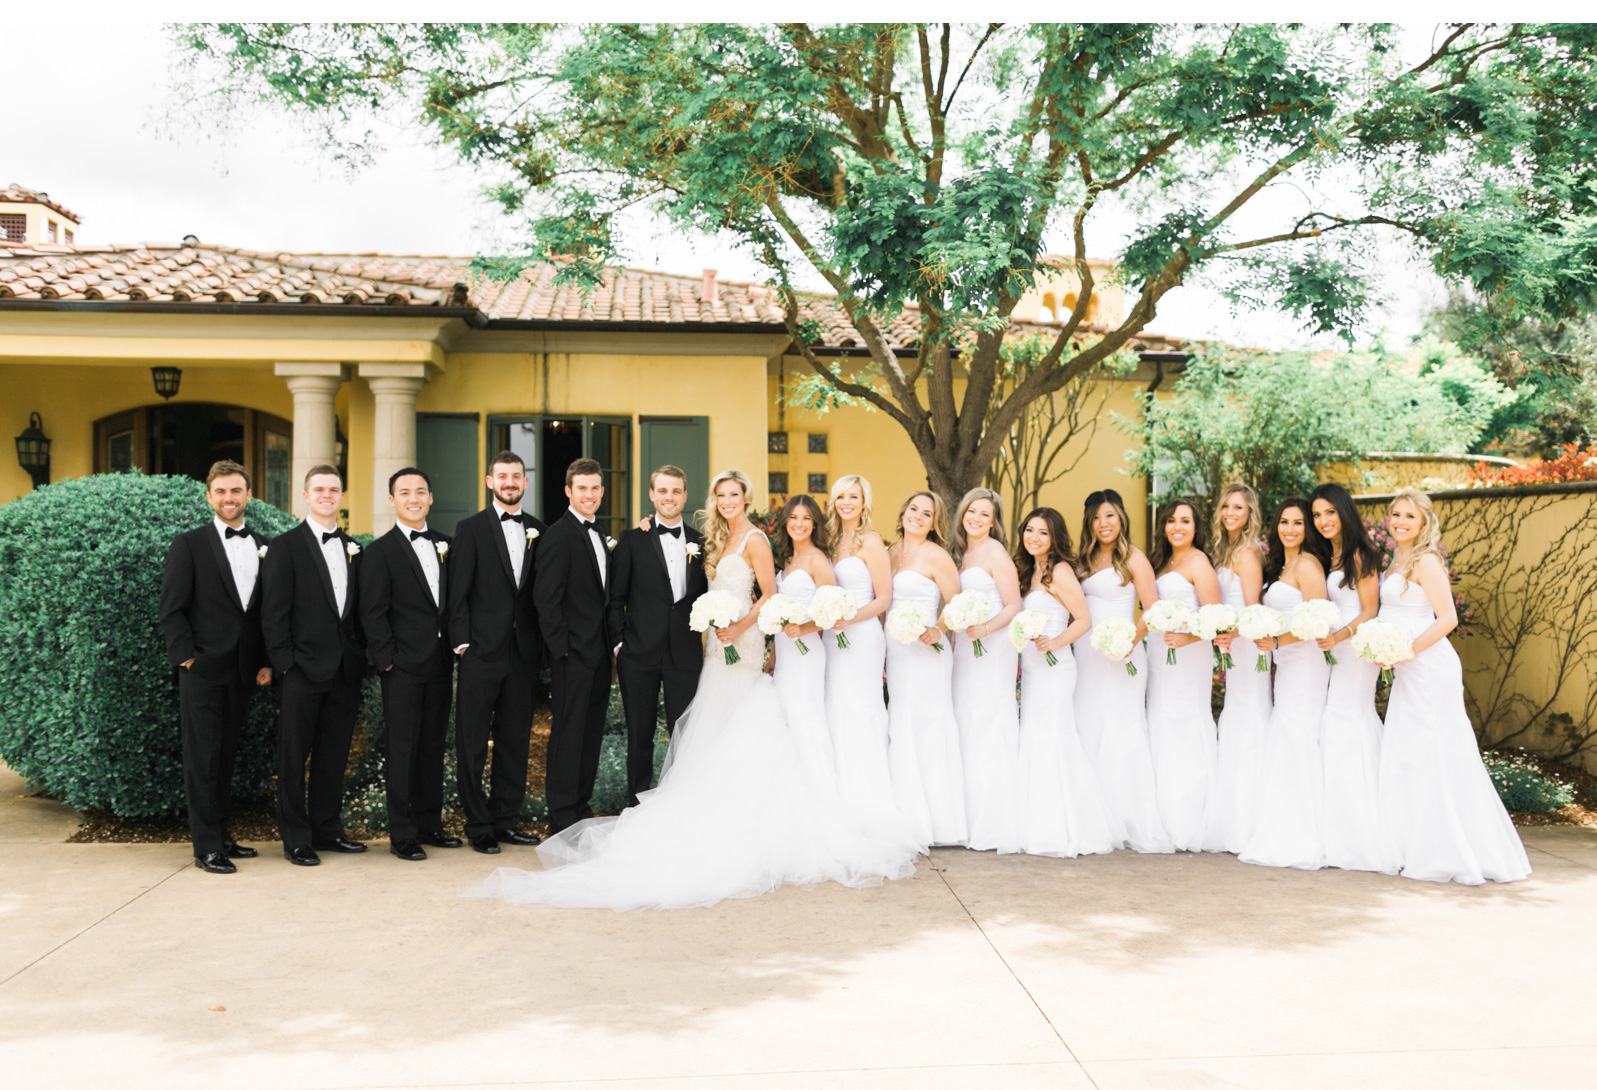 Southern-California-Wedding-Photographer-Natalie-Schutt-Photography_10.jpg